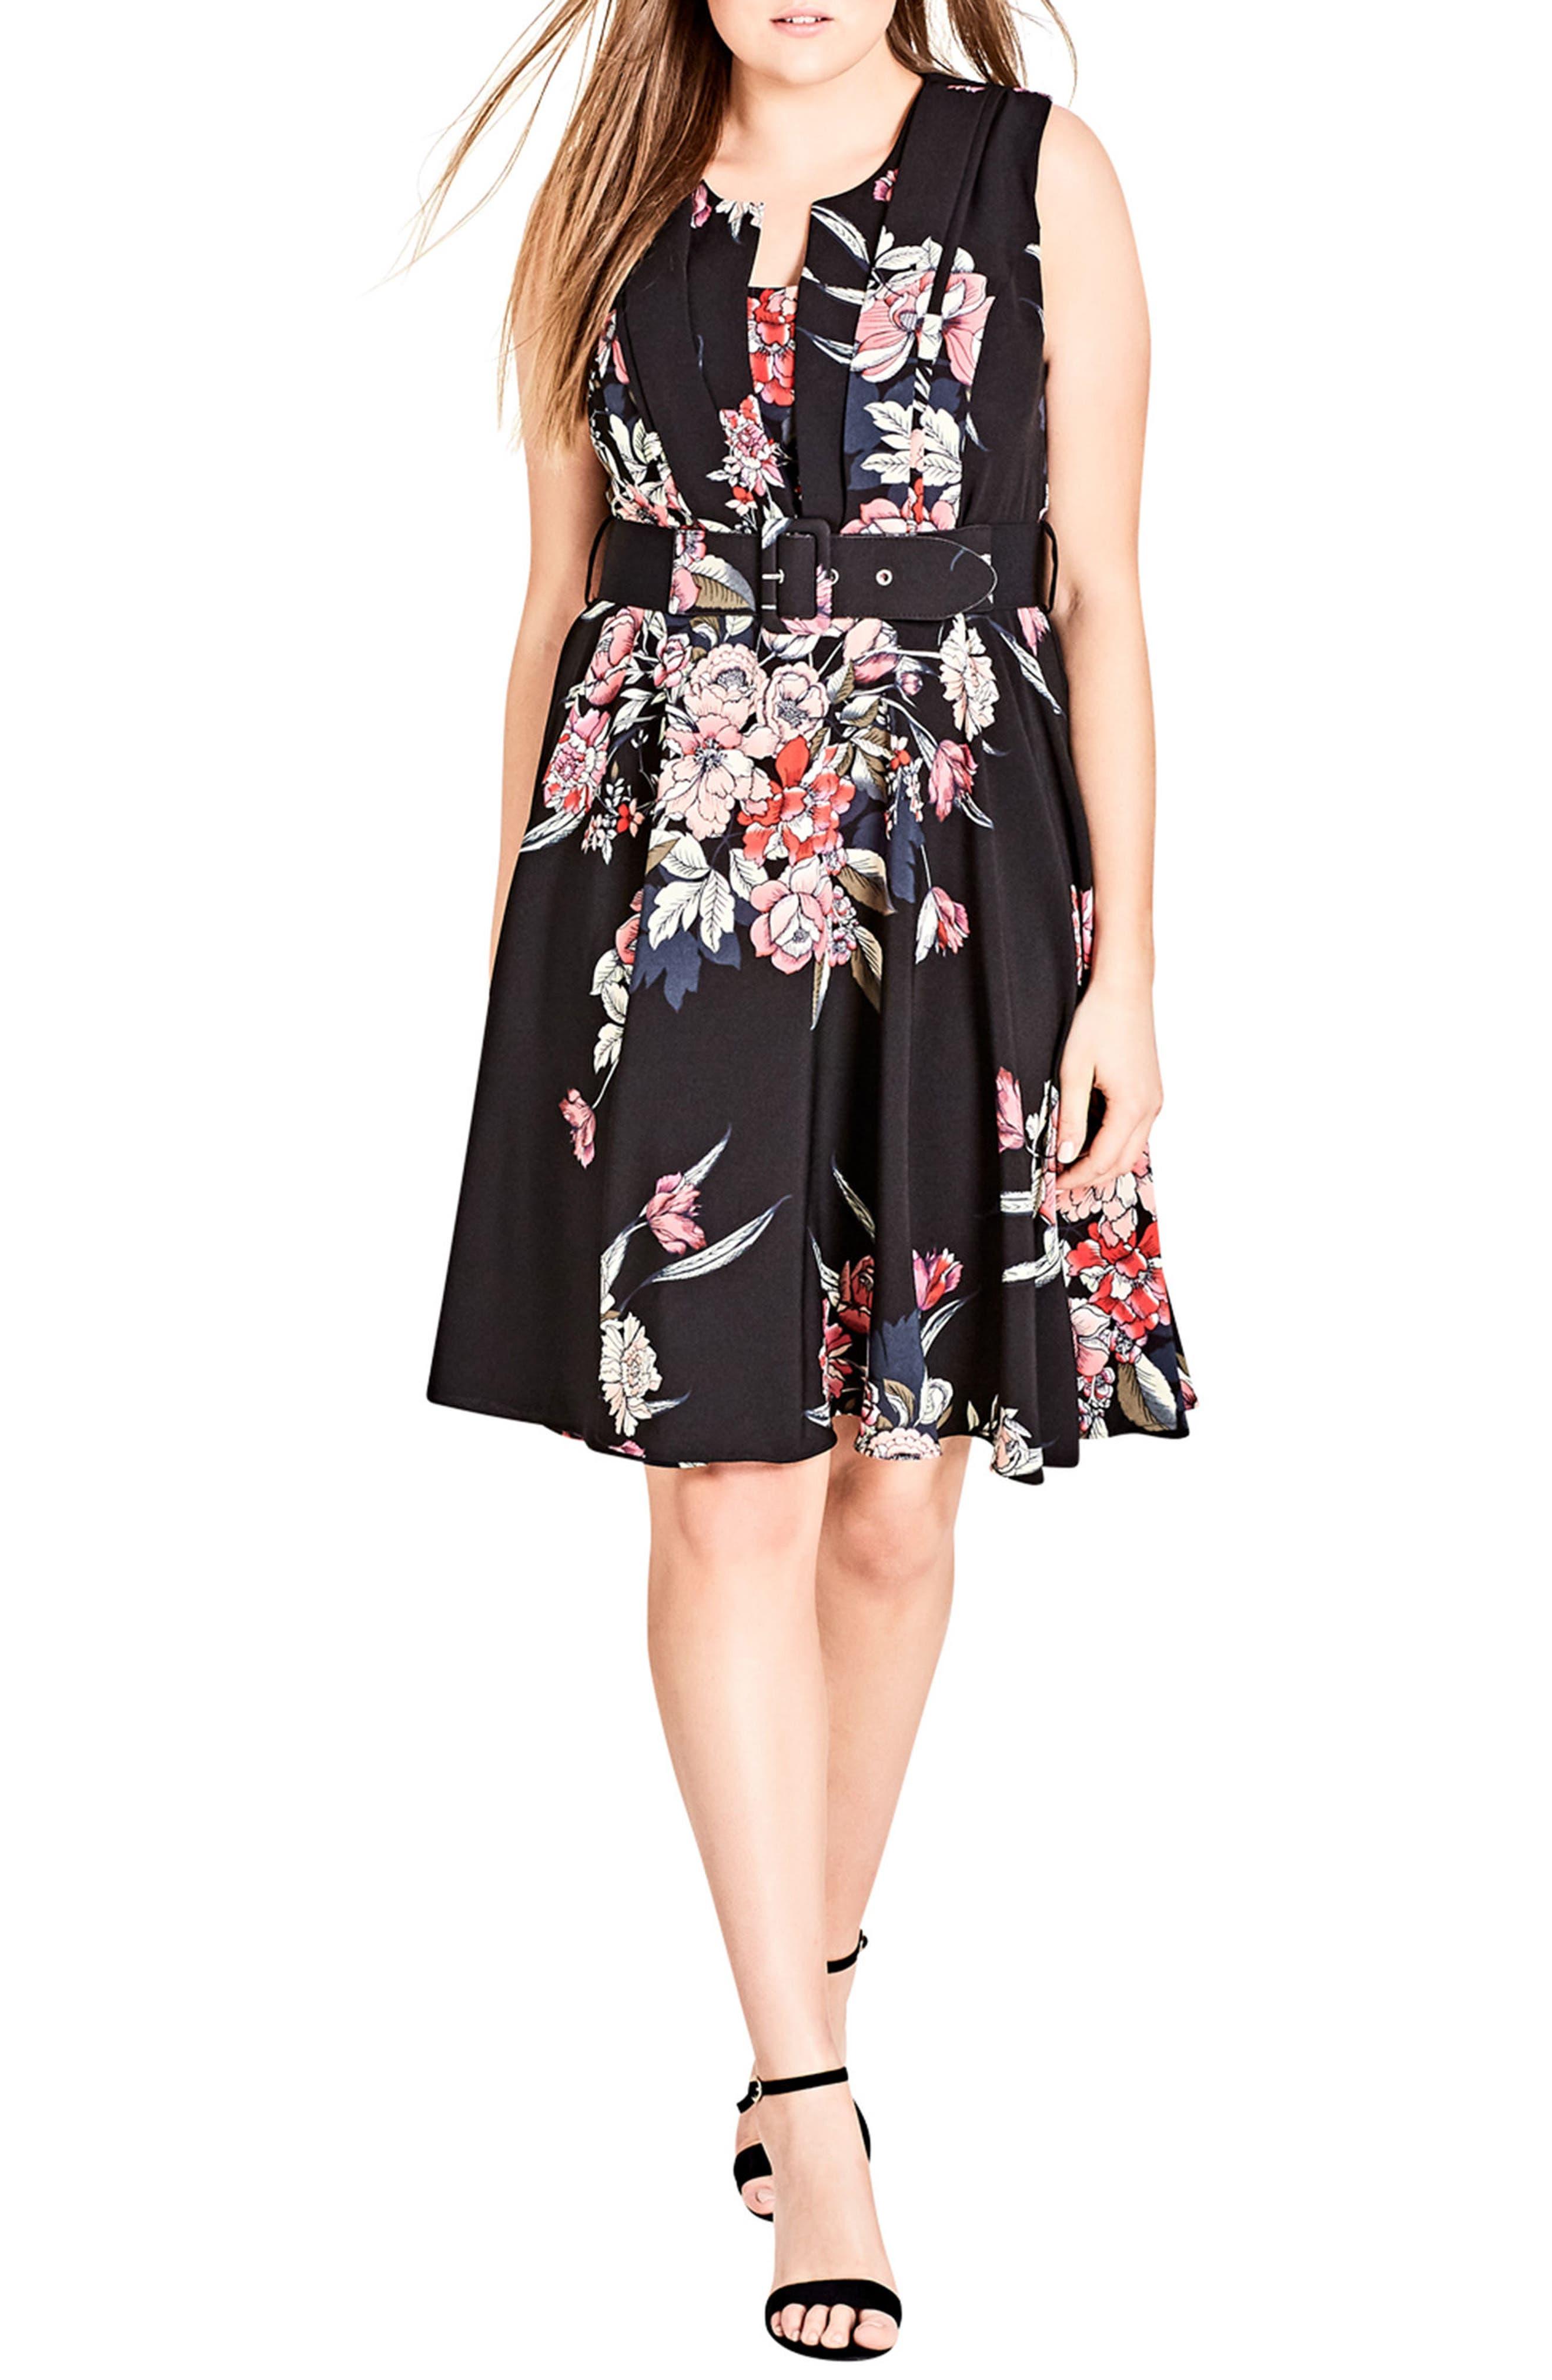 Misty Floral Fit & Flare Dress,                             Main thumbnail 1, color,                             MISTY FLORAL